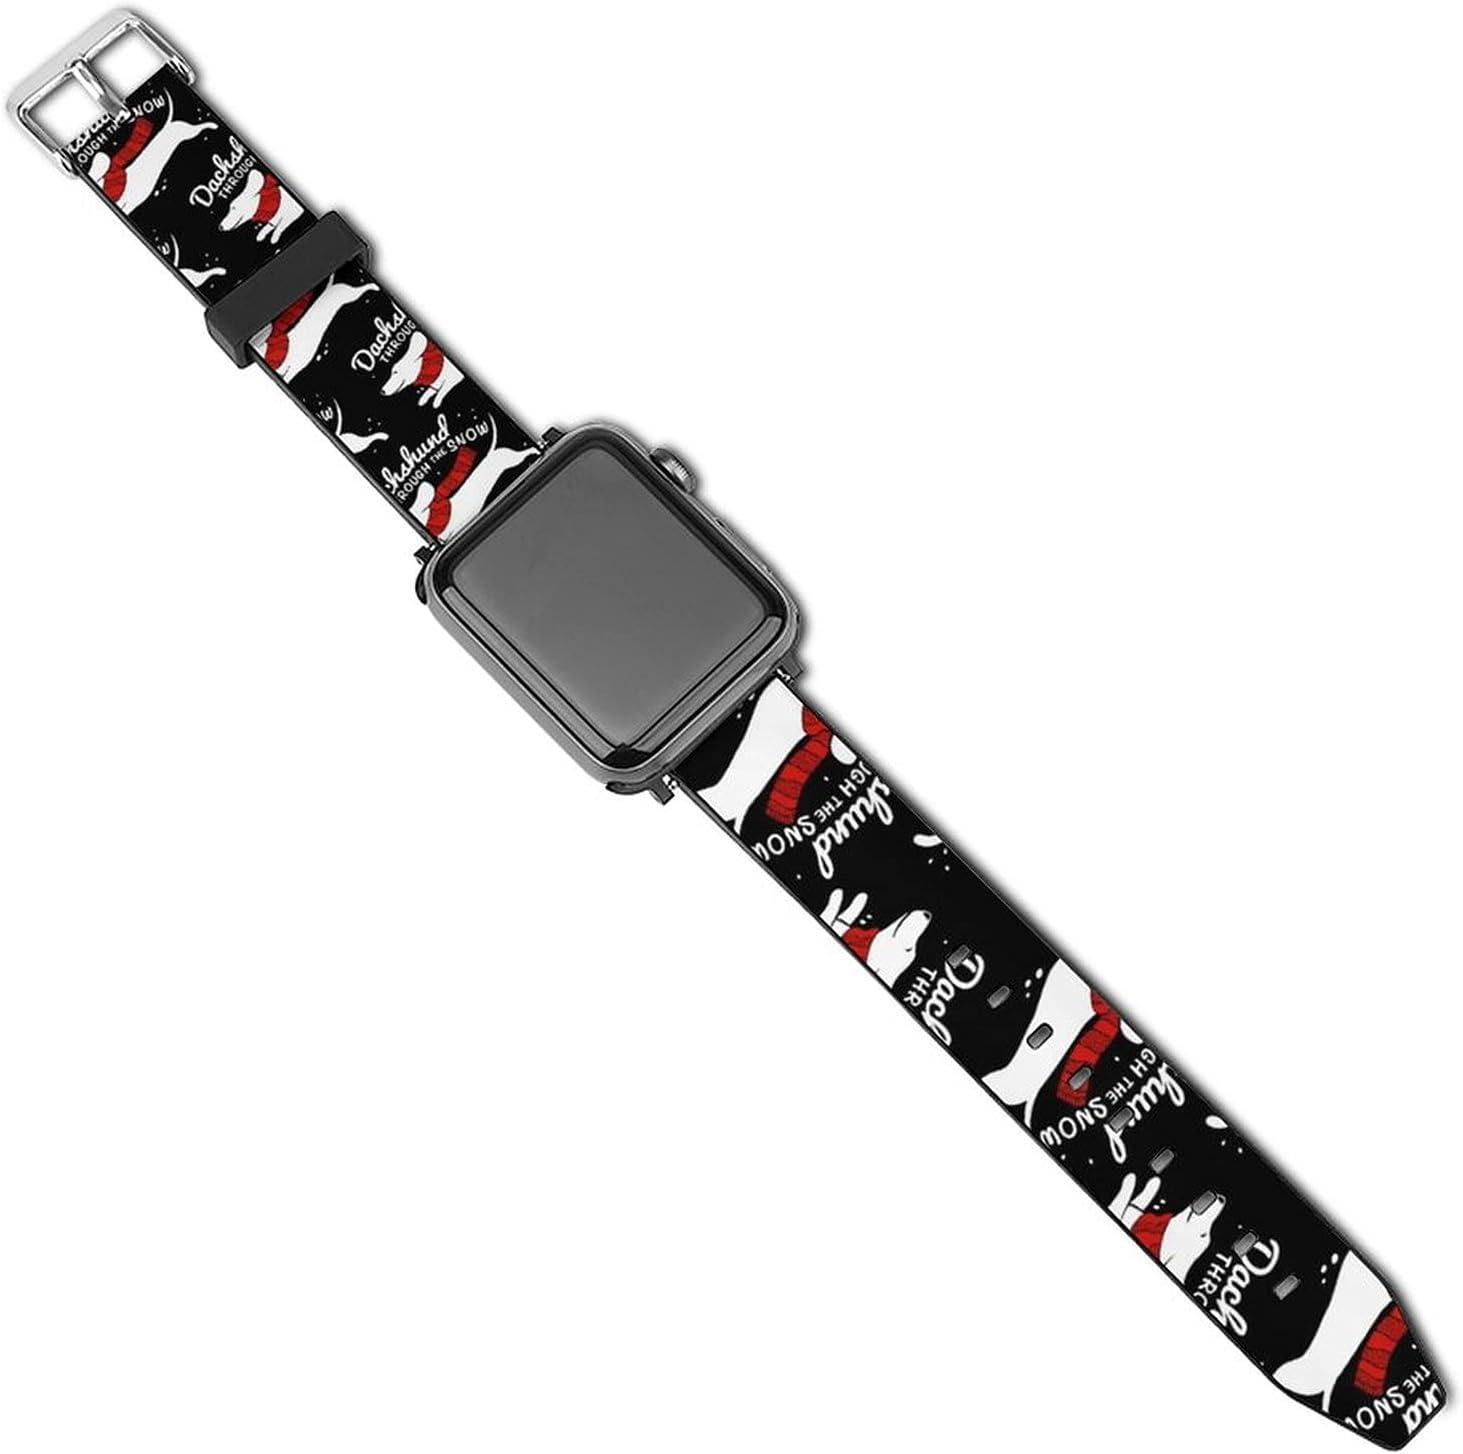 Red Scarf Daschund Through The Wristbands Virginia Beach Mall Snow Christmas Ranking TOP20 C Black